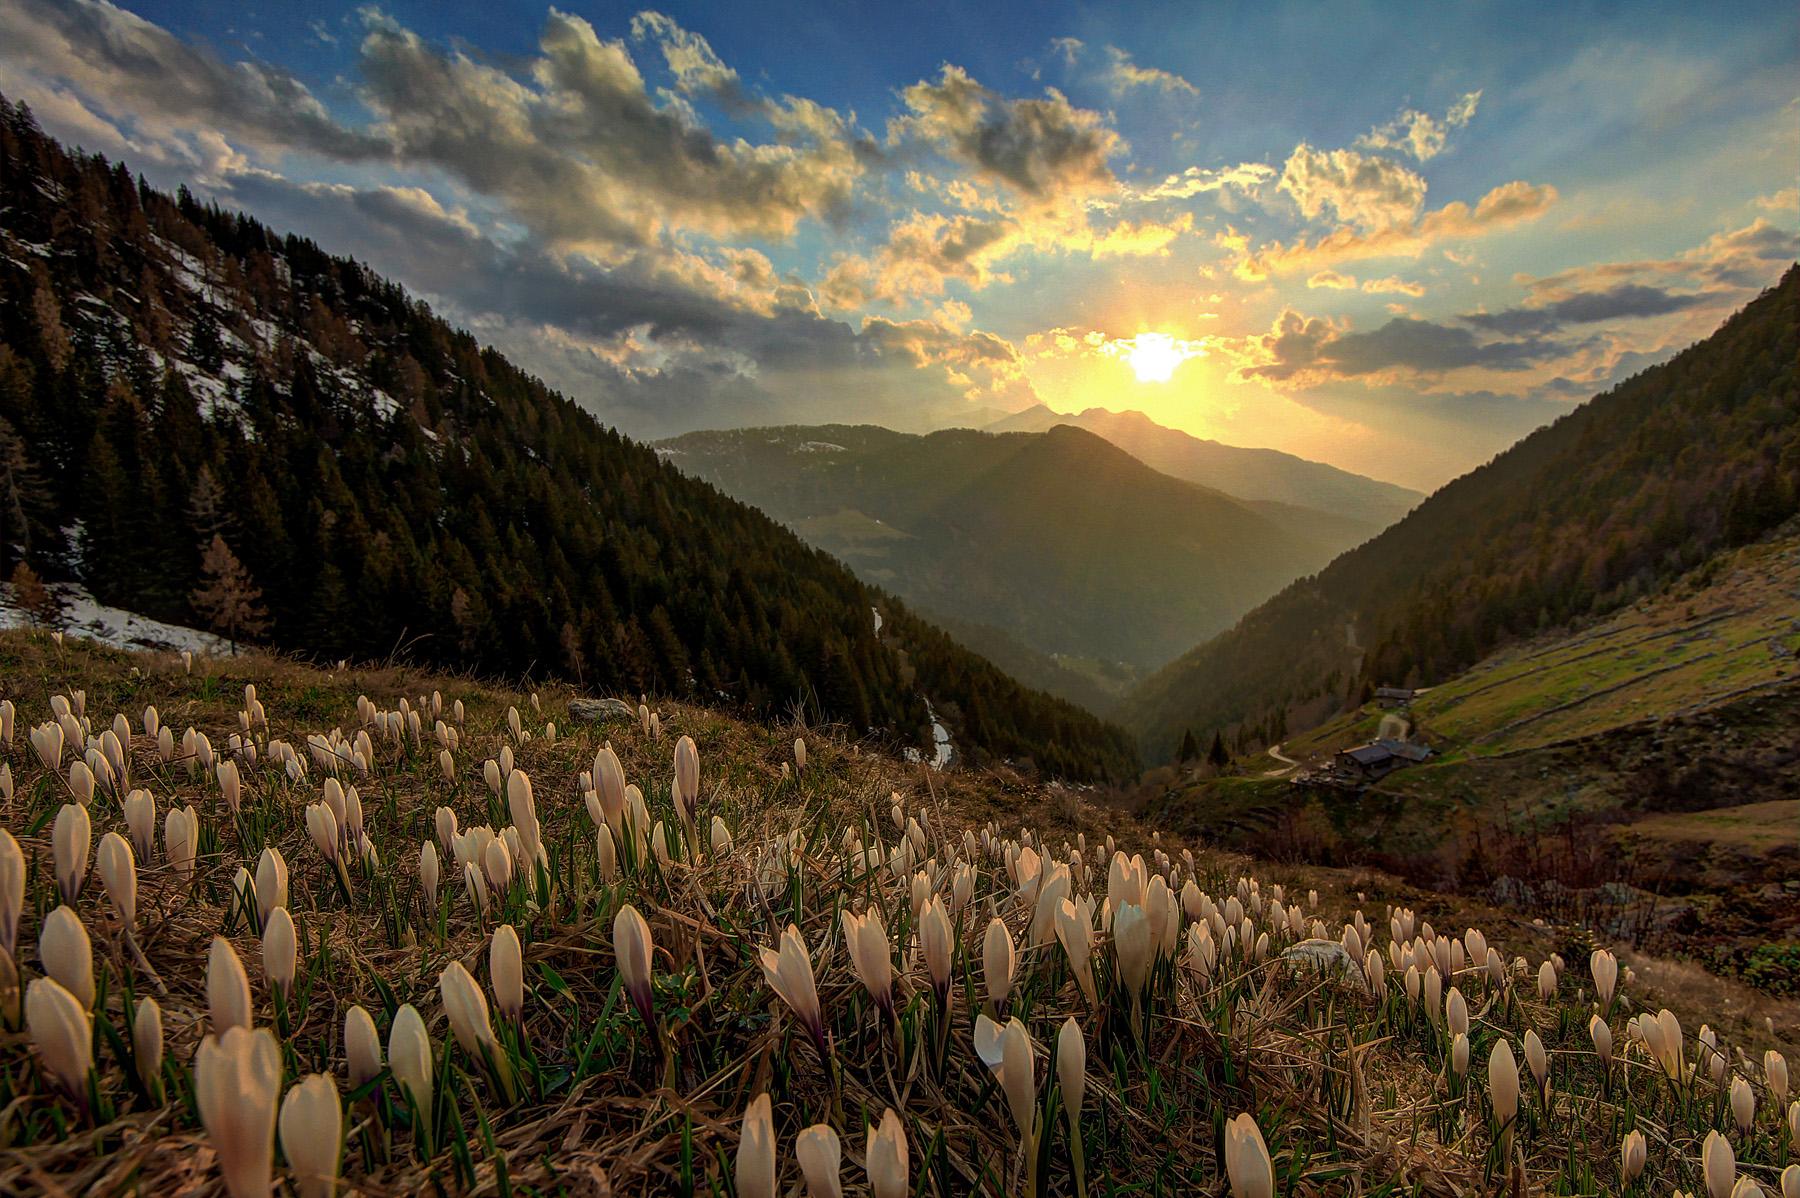 Alpe lake at sunset...